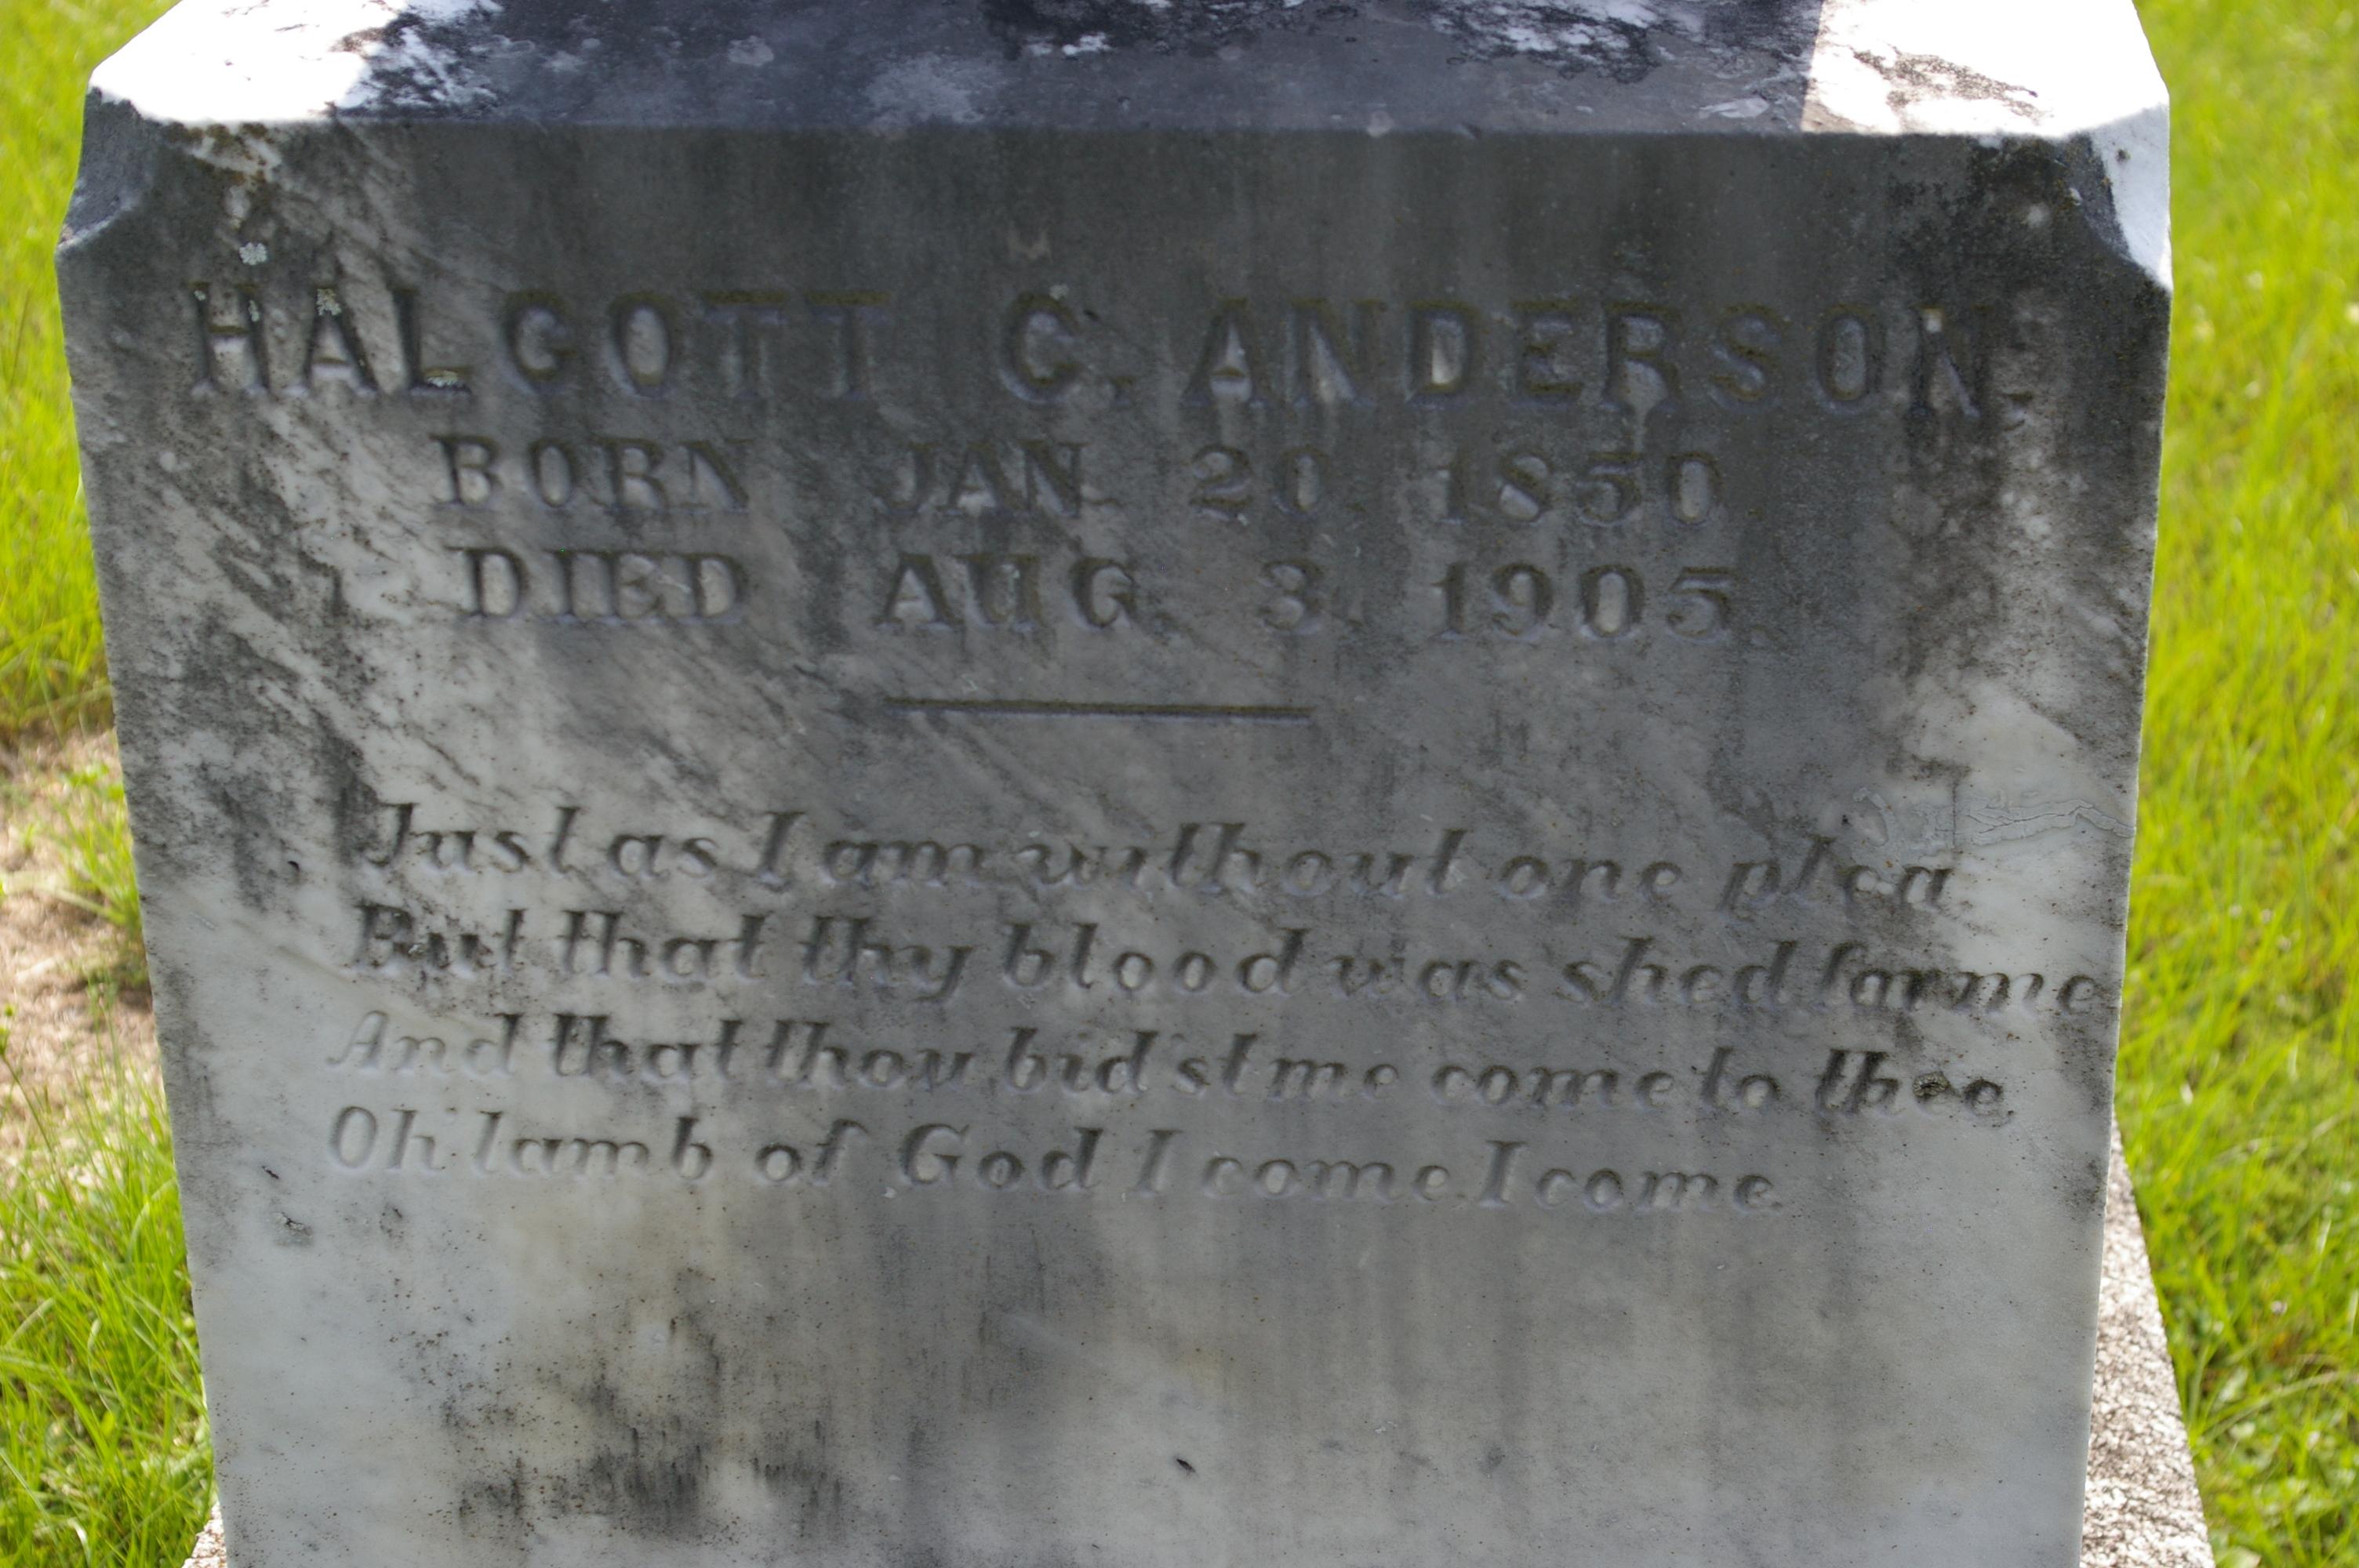 Halcott C. Anderson